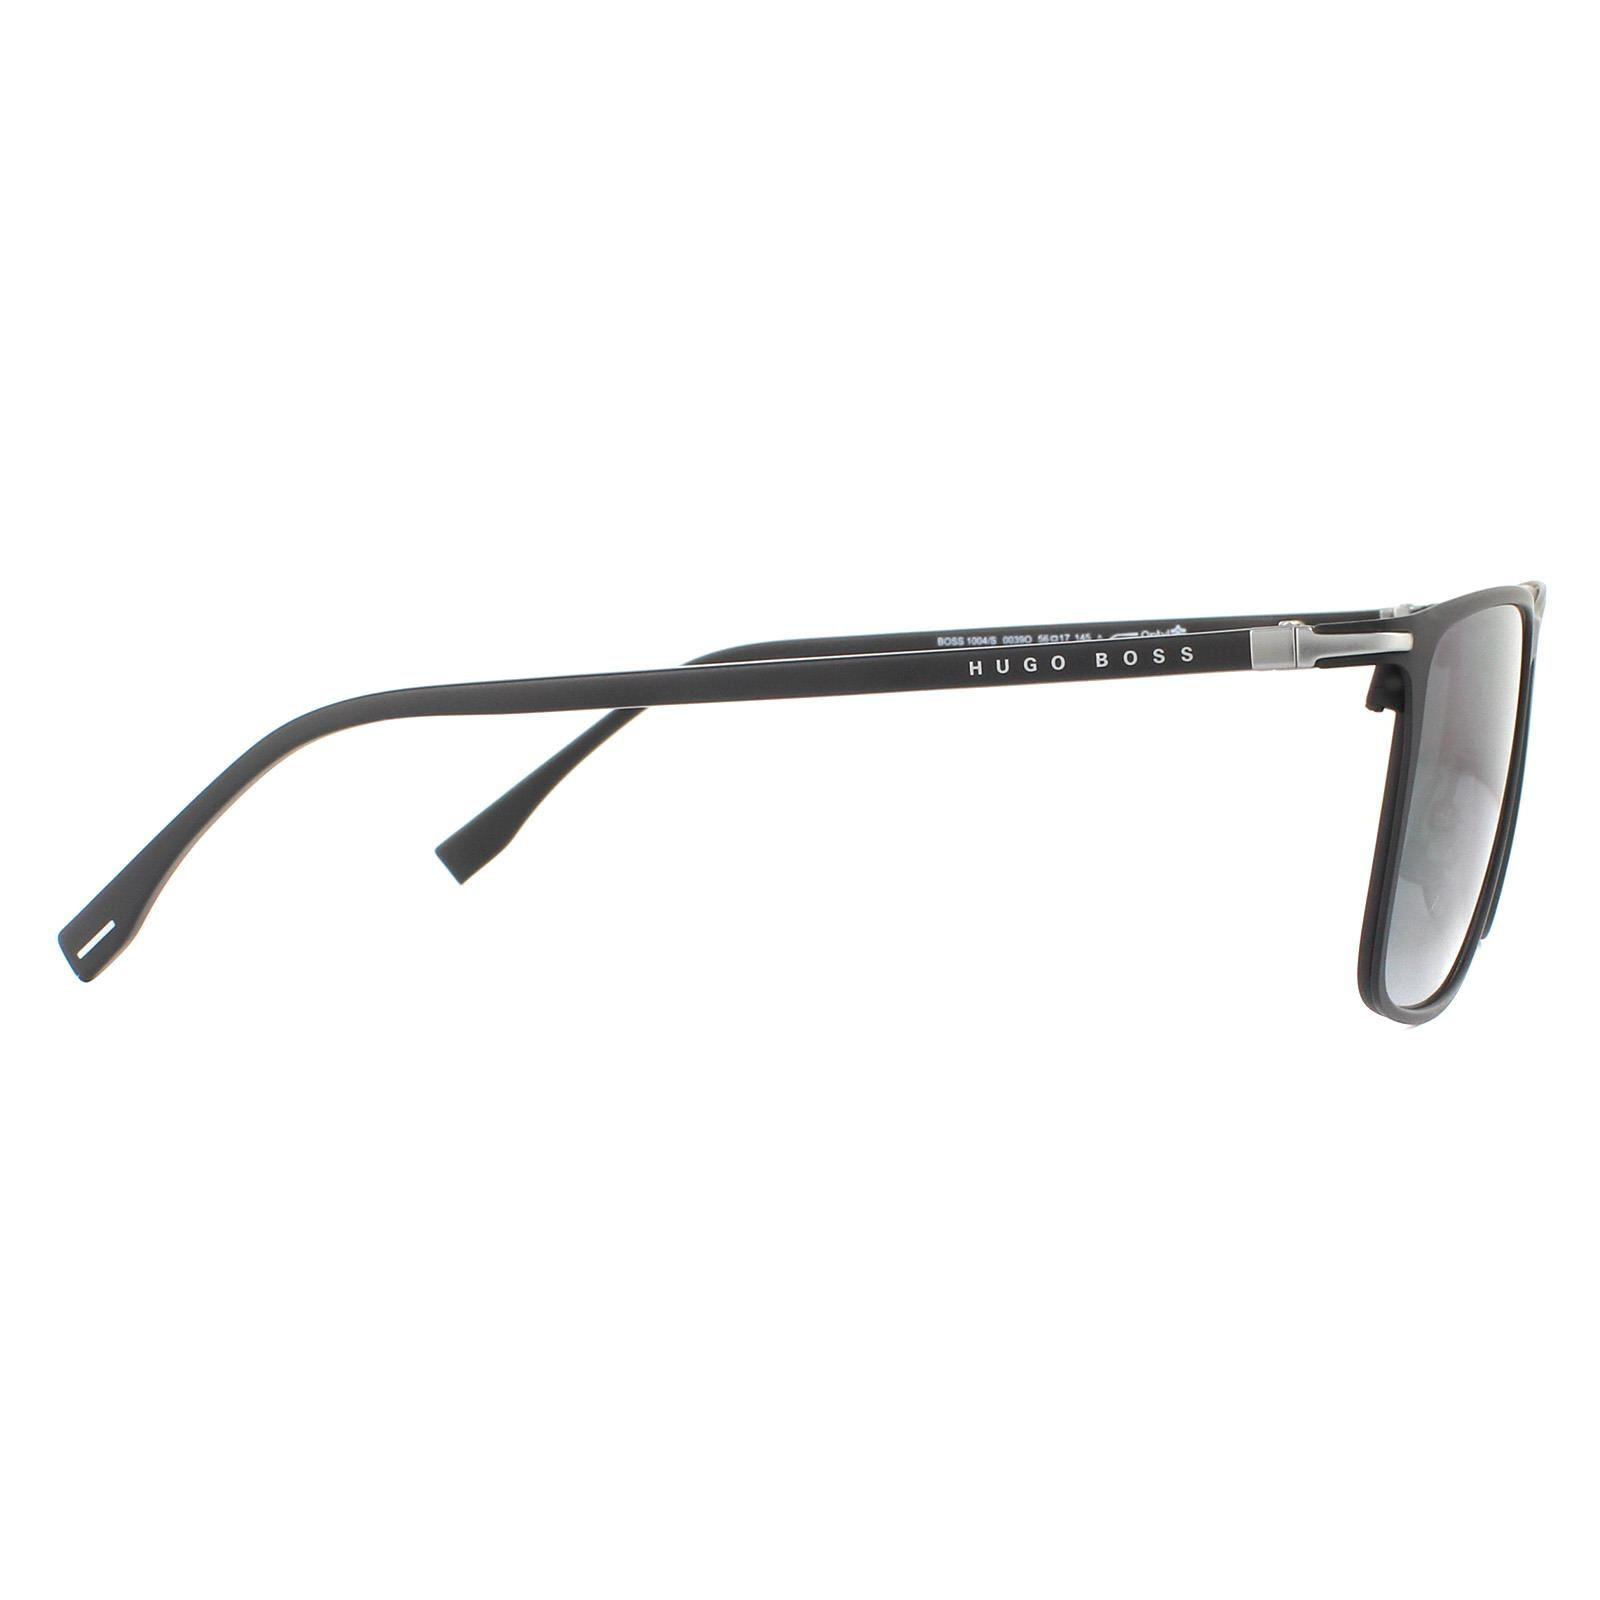 Hugo Boss Sunglasses 1004/S 003 9O Matte Black Grey Gradient